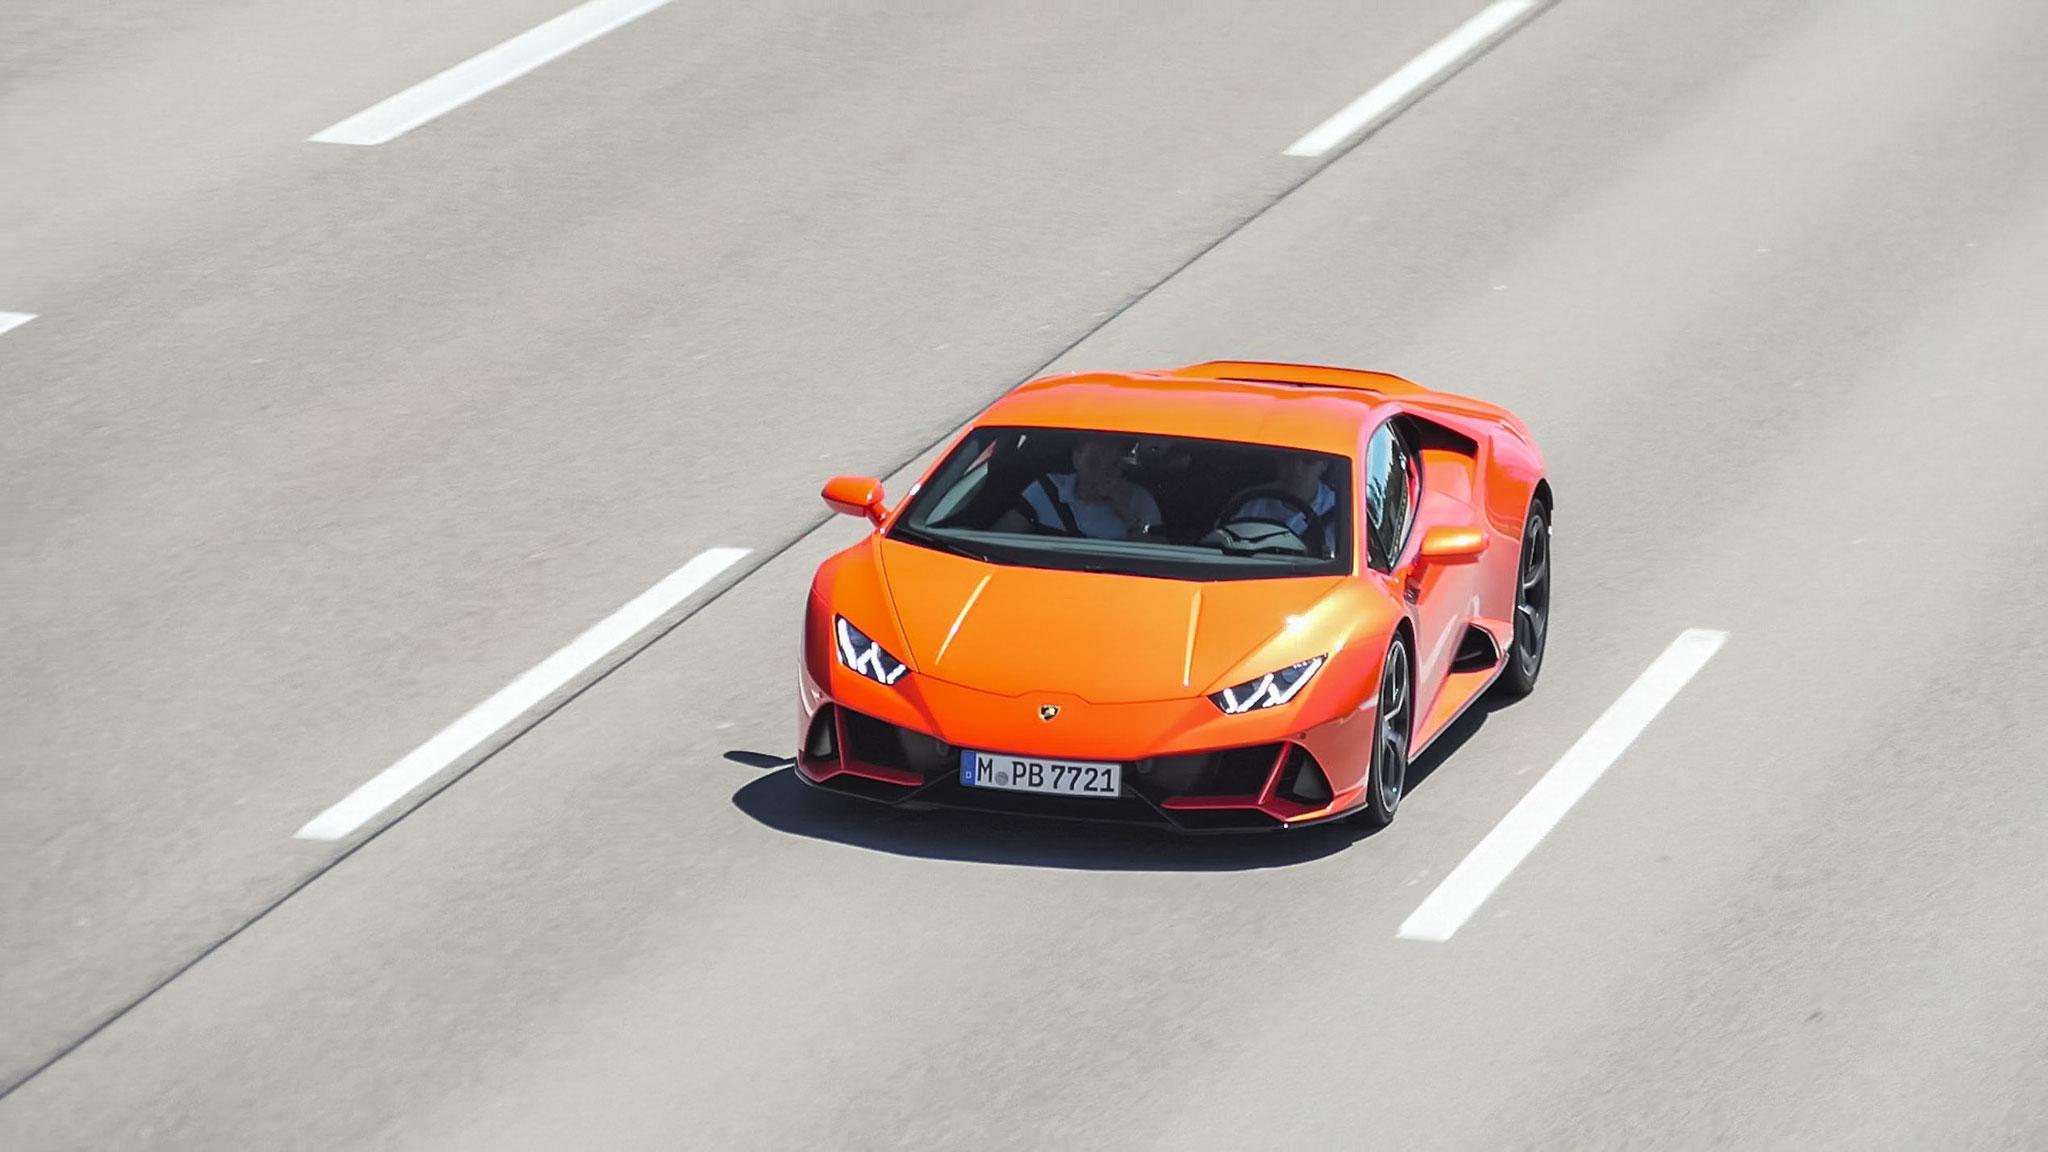 Lamborghini Huracan Evo - M-PB-7721